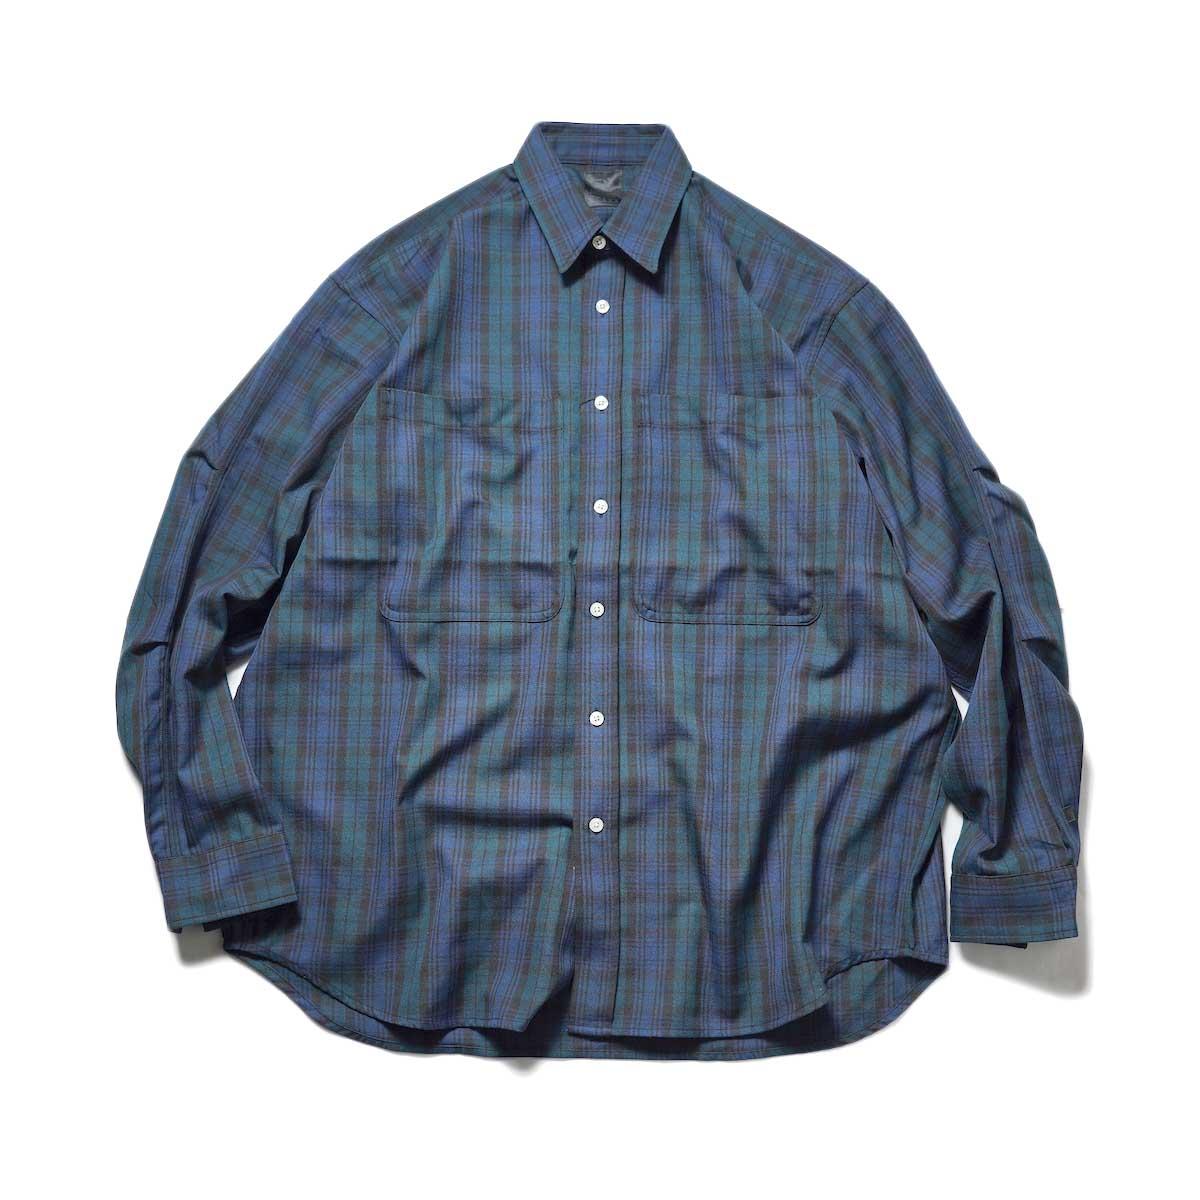 DAIWA PIER39 / TECH FLANNEL WORKER'S SHIRTS (Black Watch)